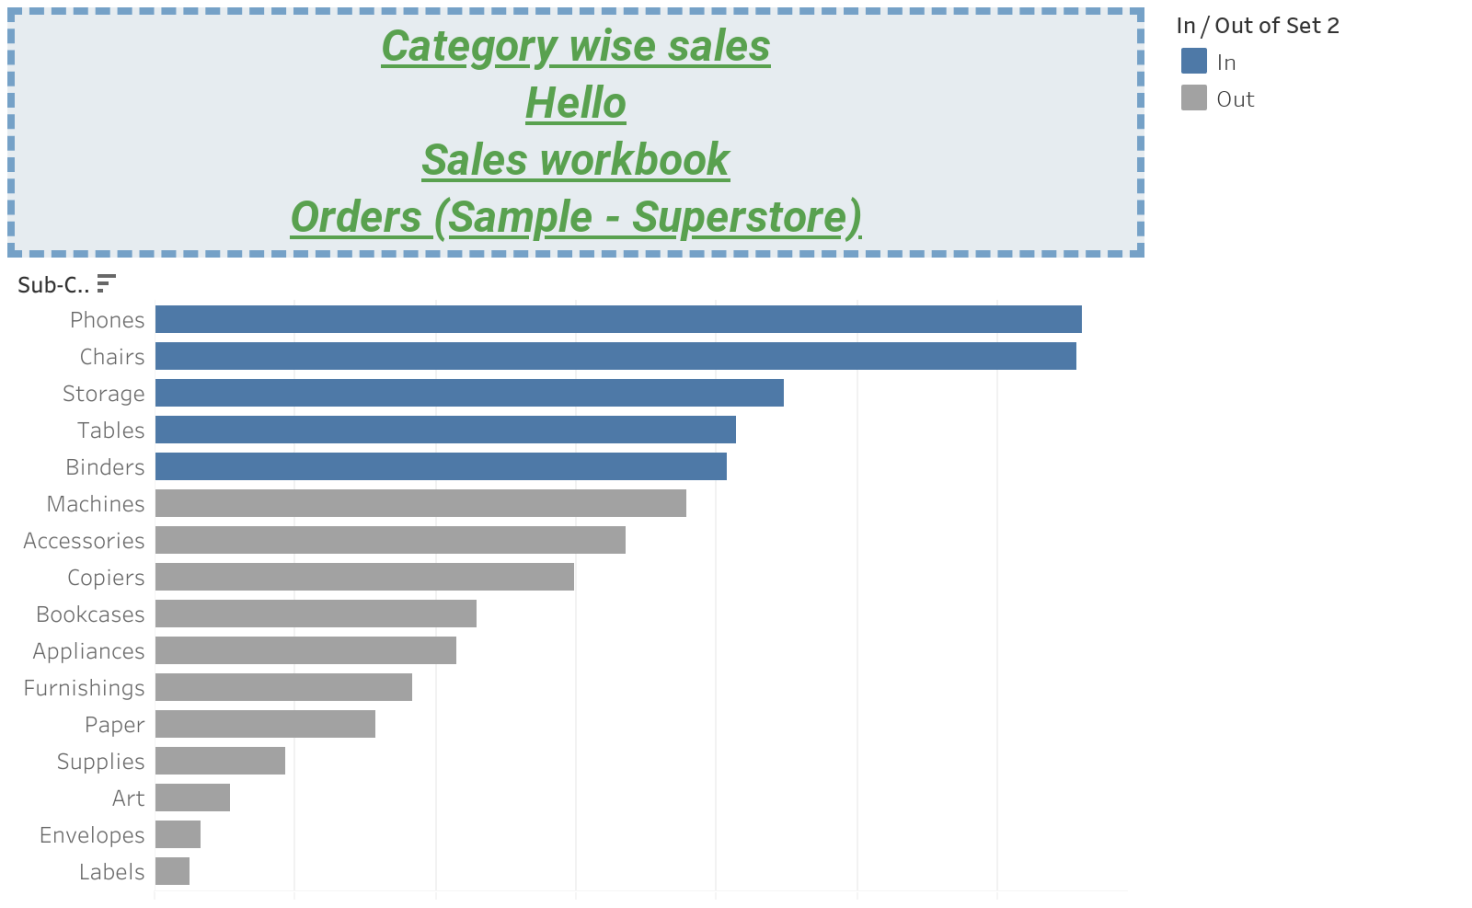 Sales Workbook